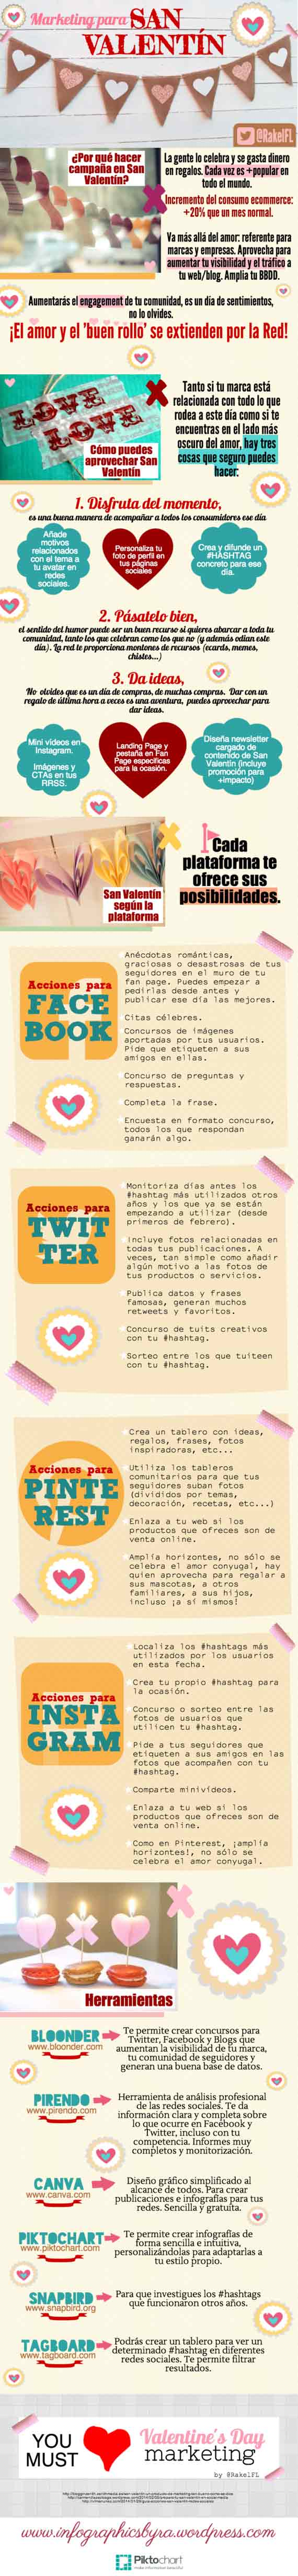 infografia_marketing_para_san_valentin